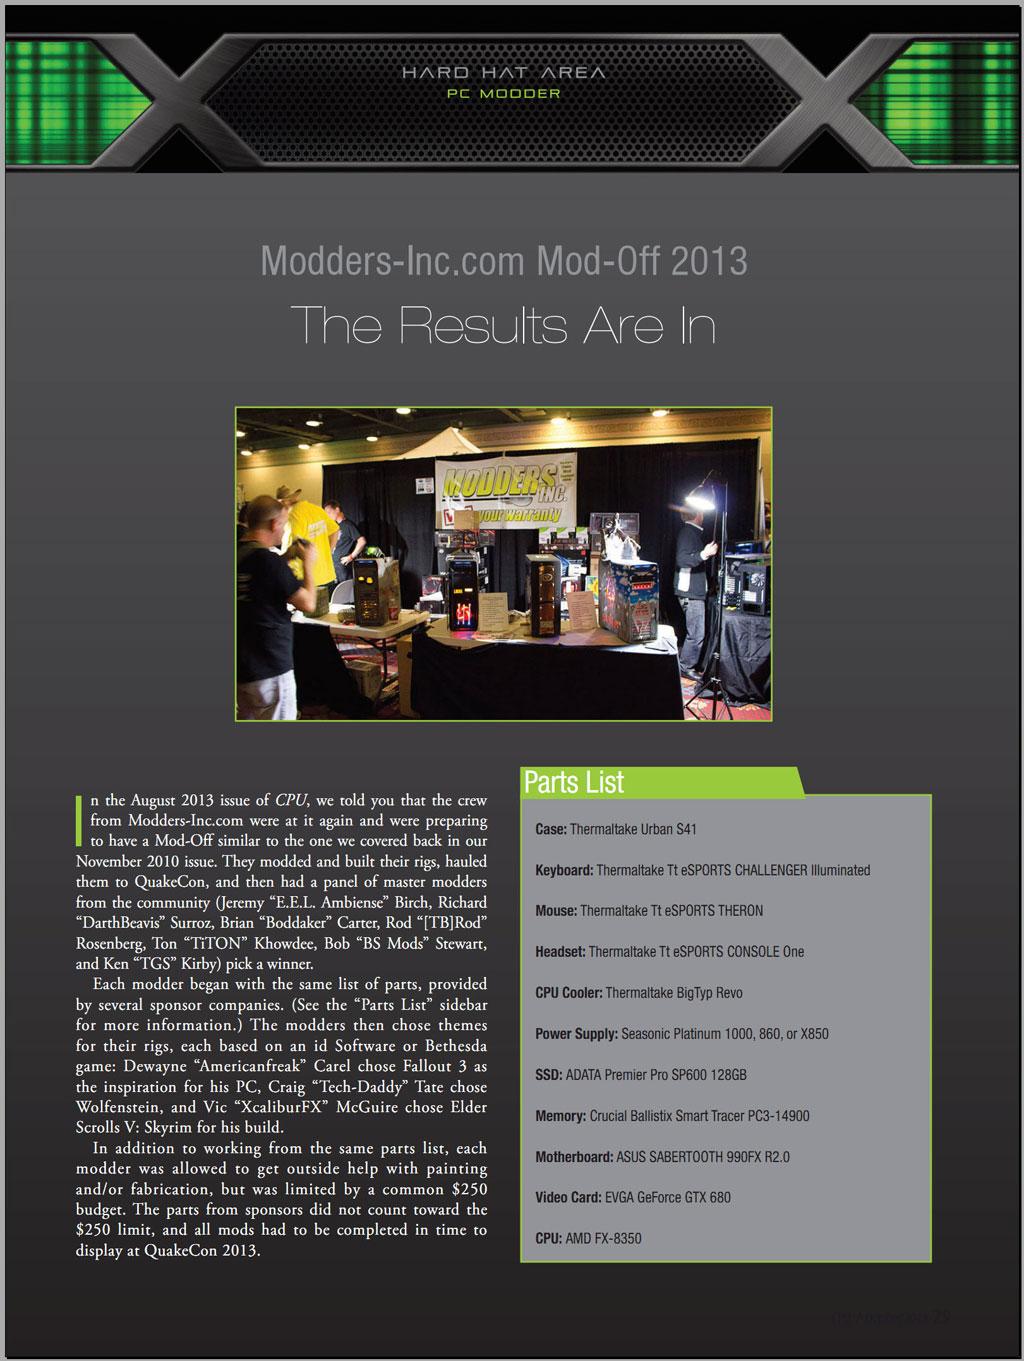 The 2013 Modders-Inc Staff vs Staff Mod-Off sponsored by